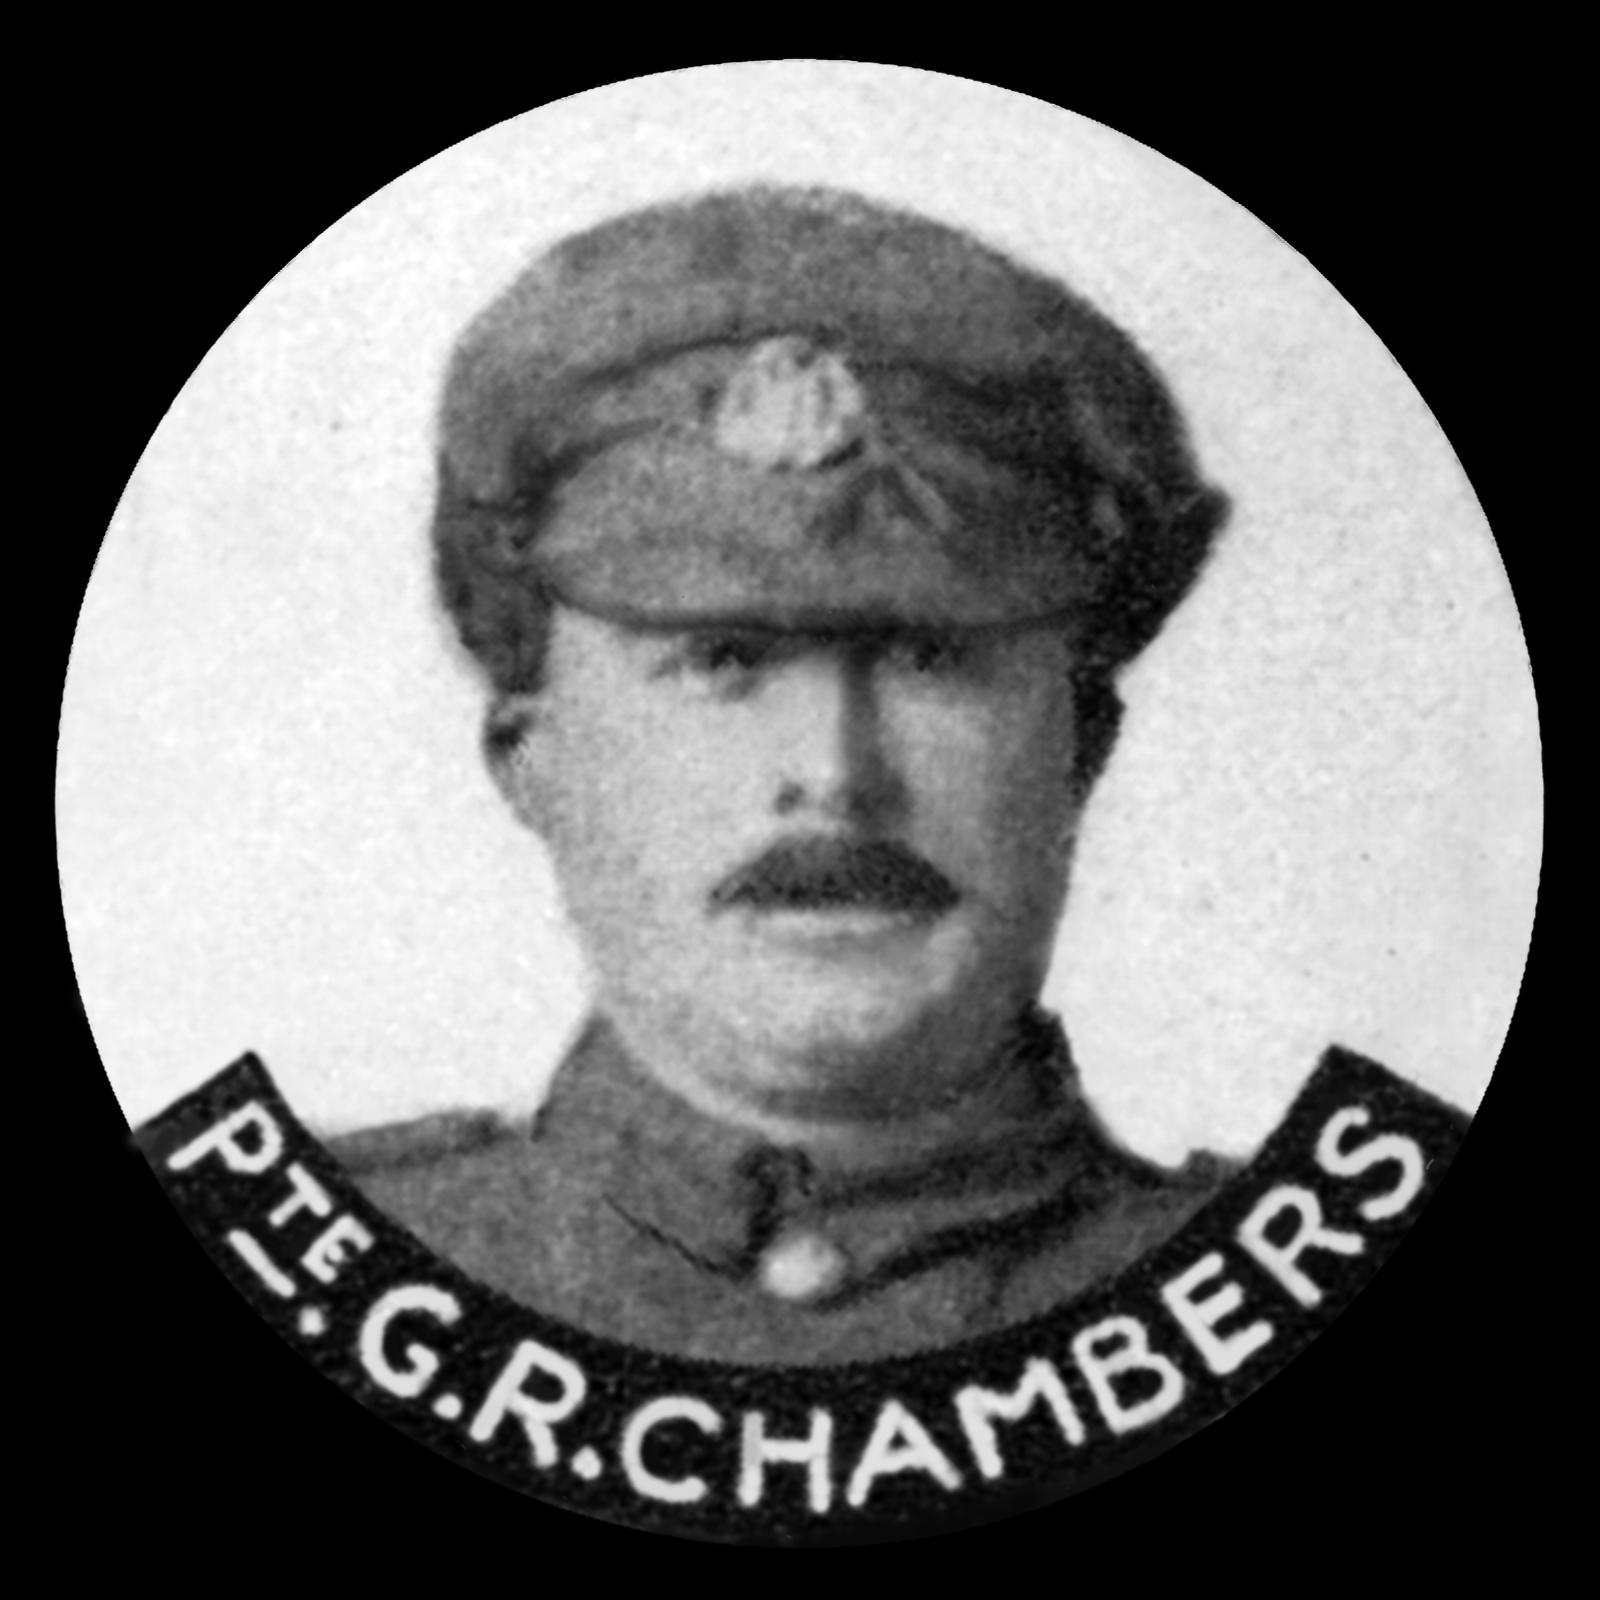 CHAMBERS George Robert